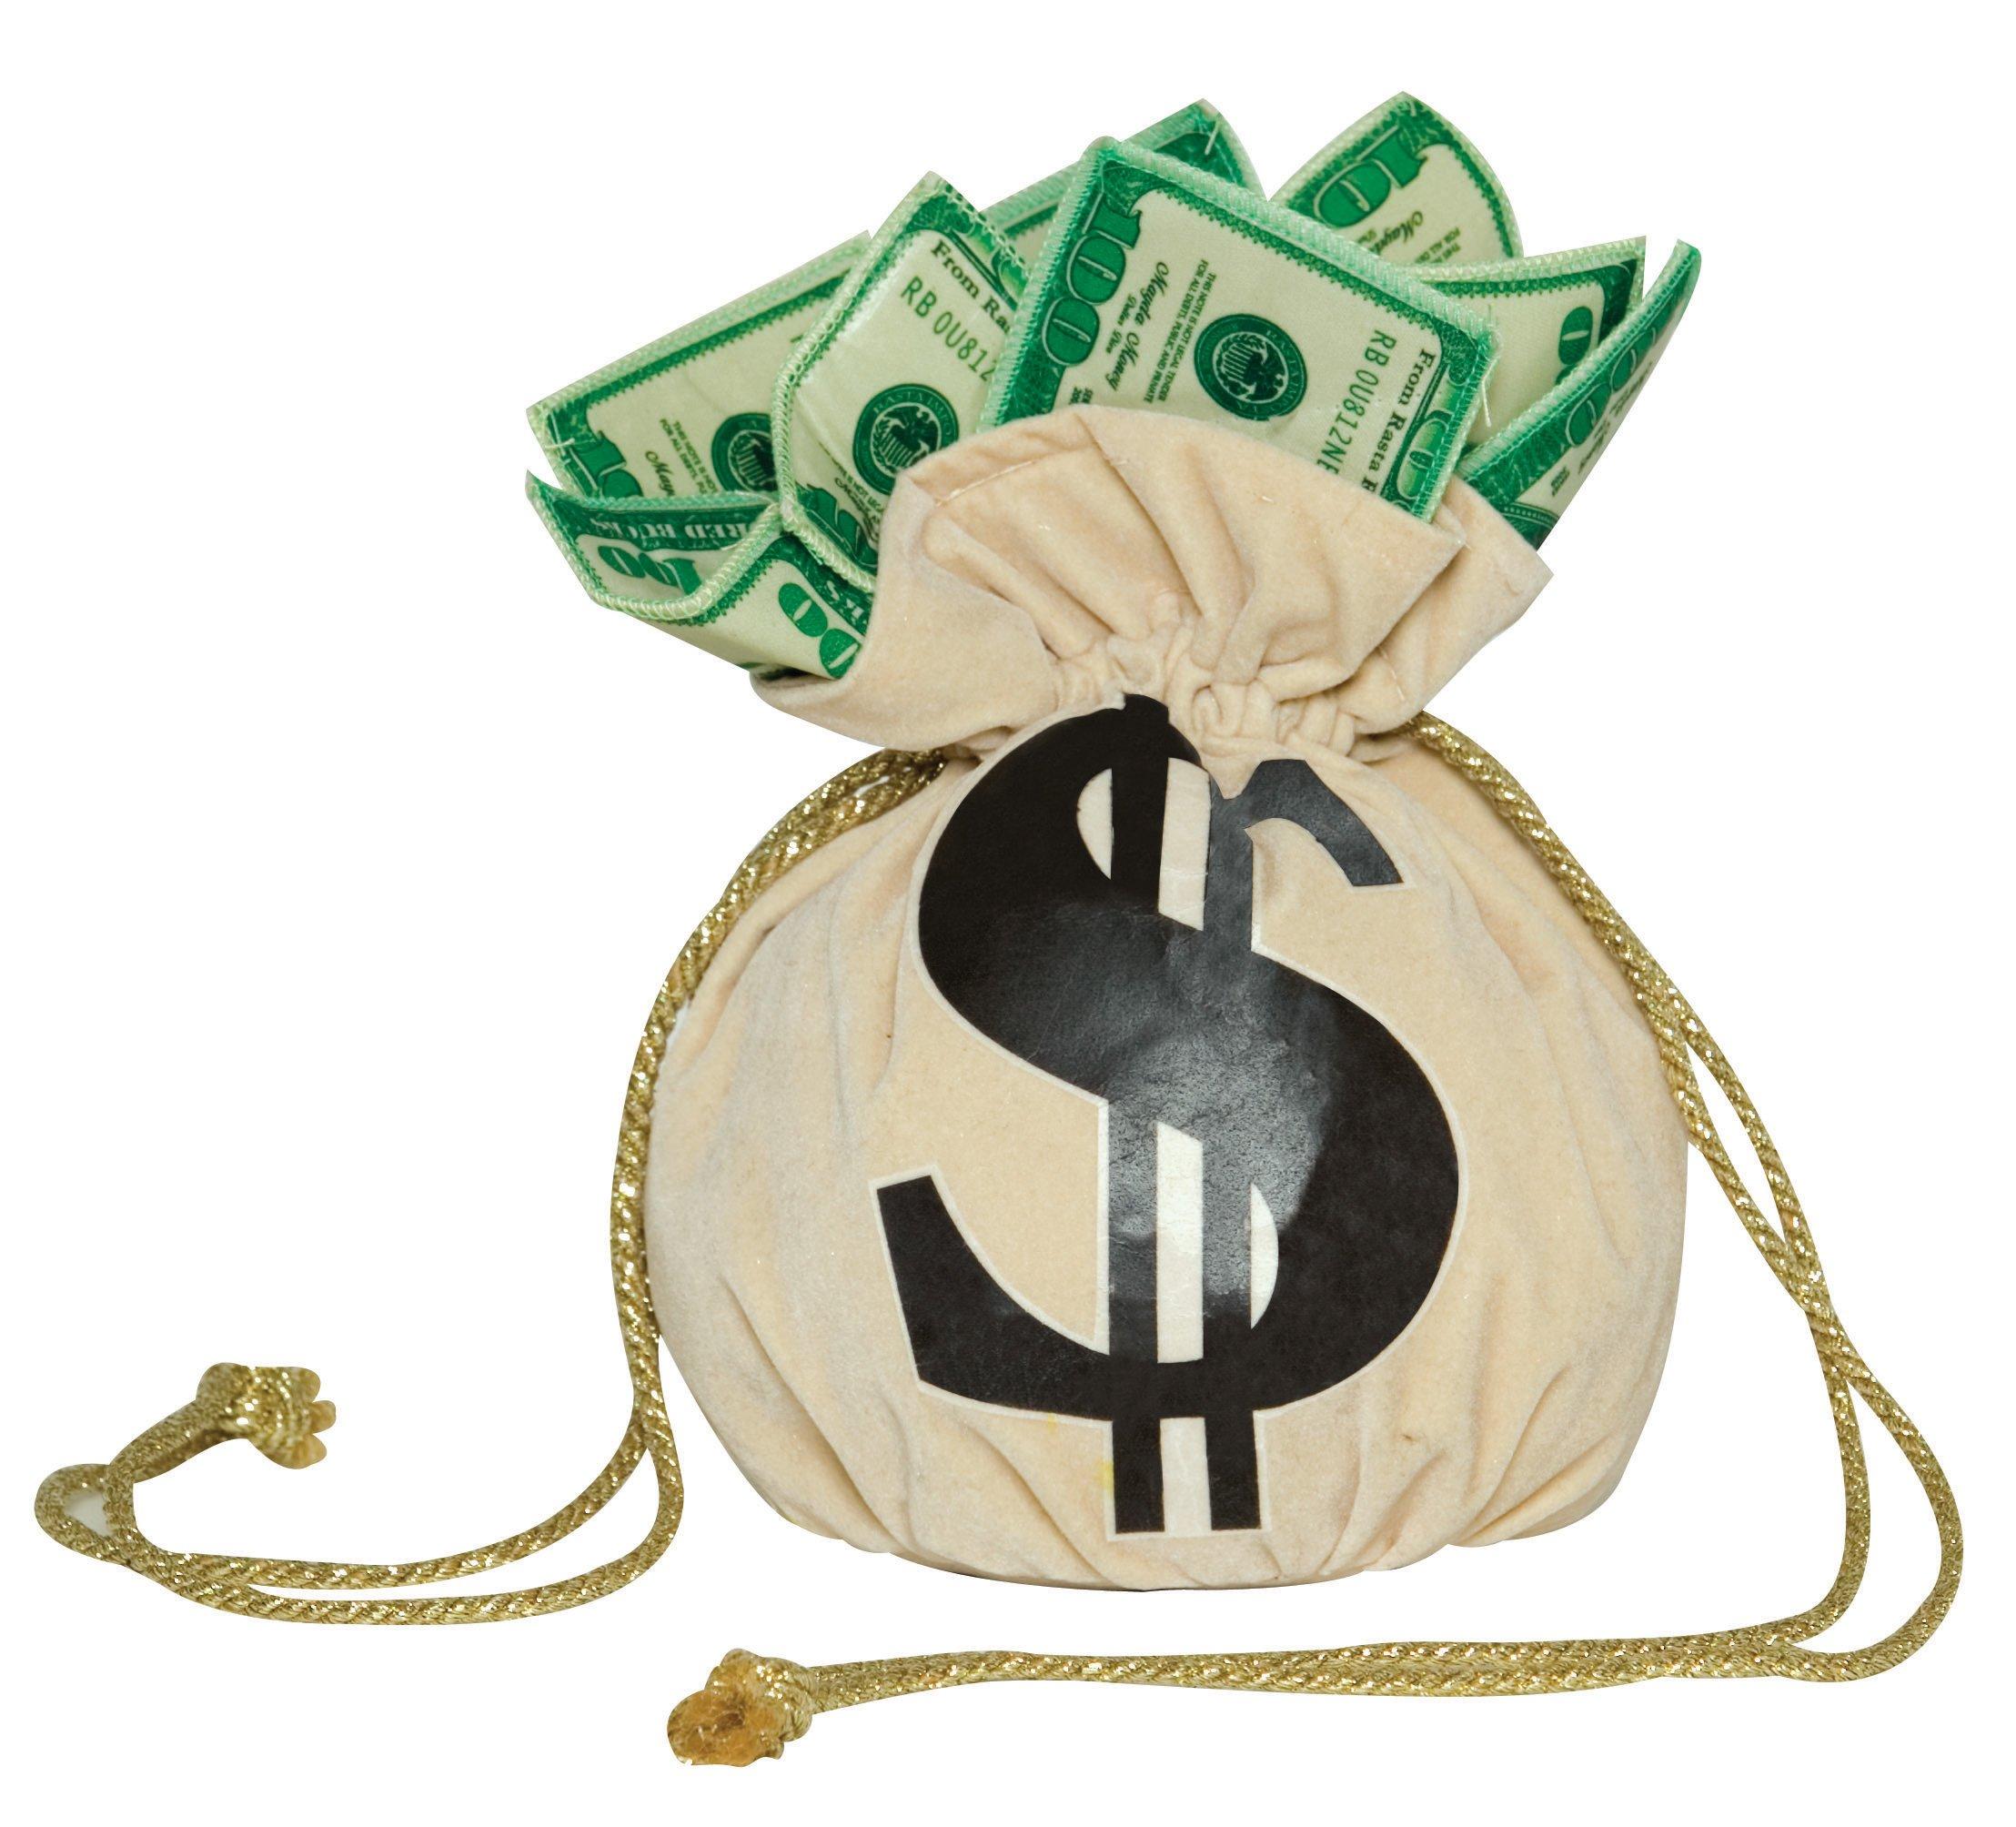 Image Credit:http://usafreemoney.com/wp-content/uploads/2013/08/bag_of_money_wallpaper-other.jpg